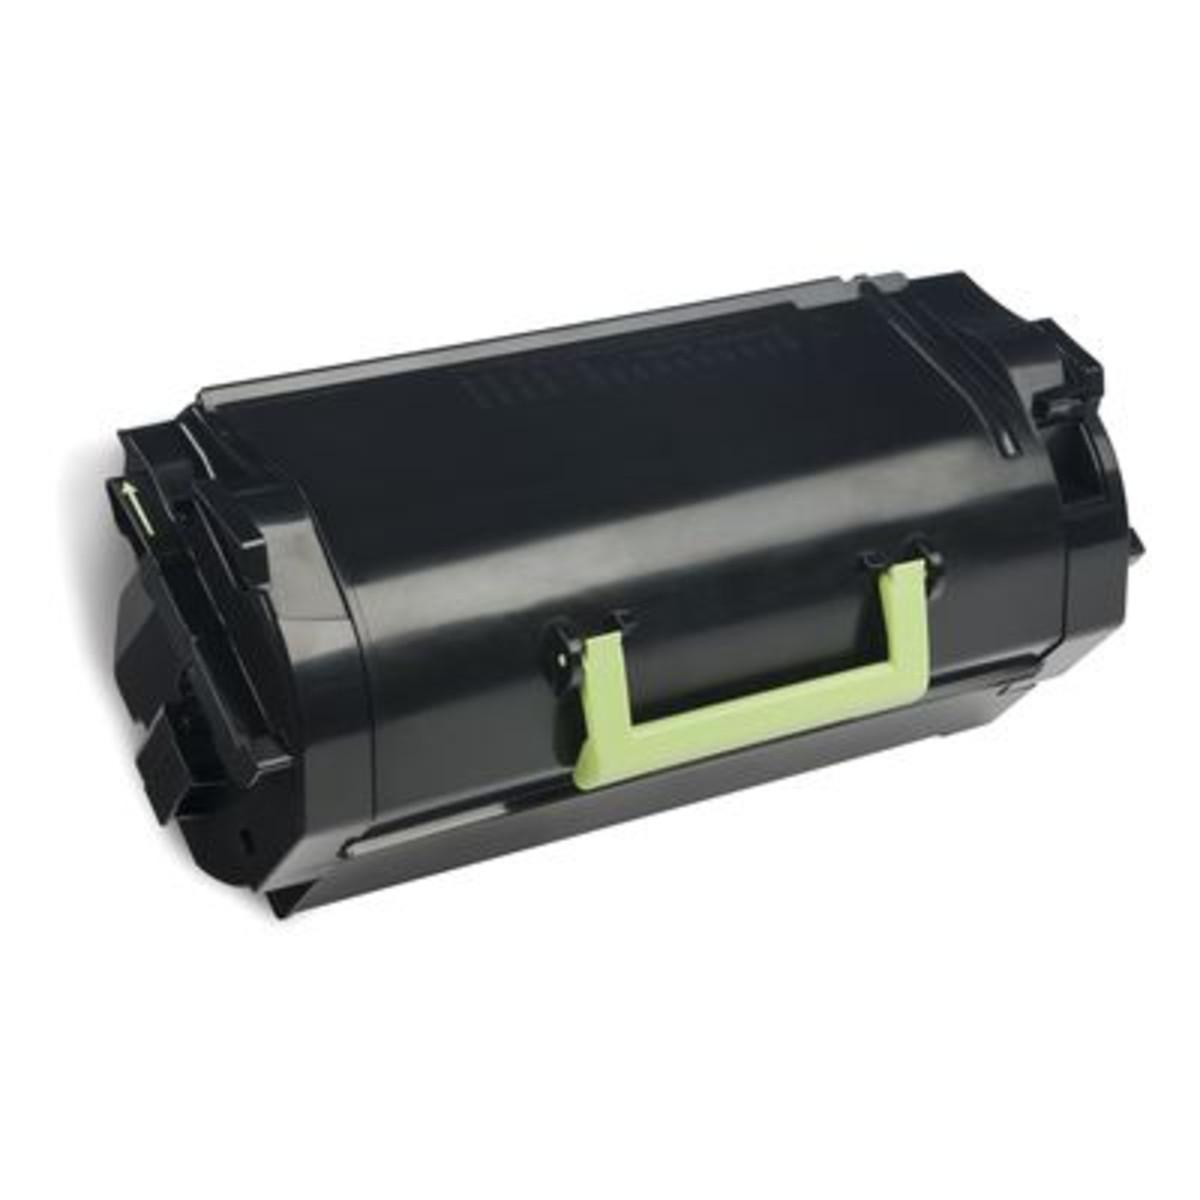 Lexmark 623X Black Toner Cartridge - High Yield